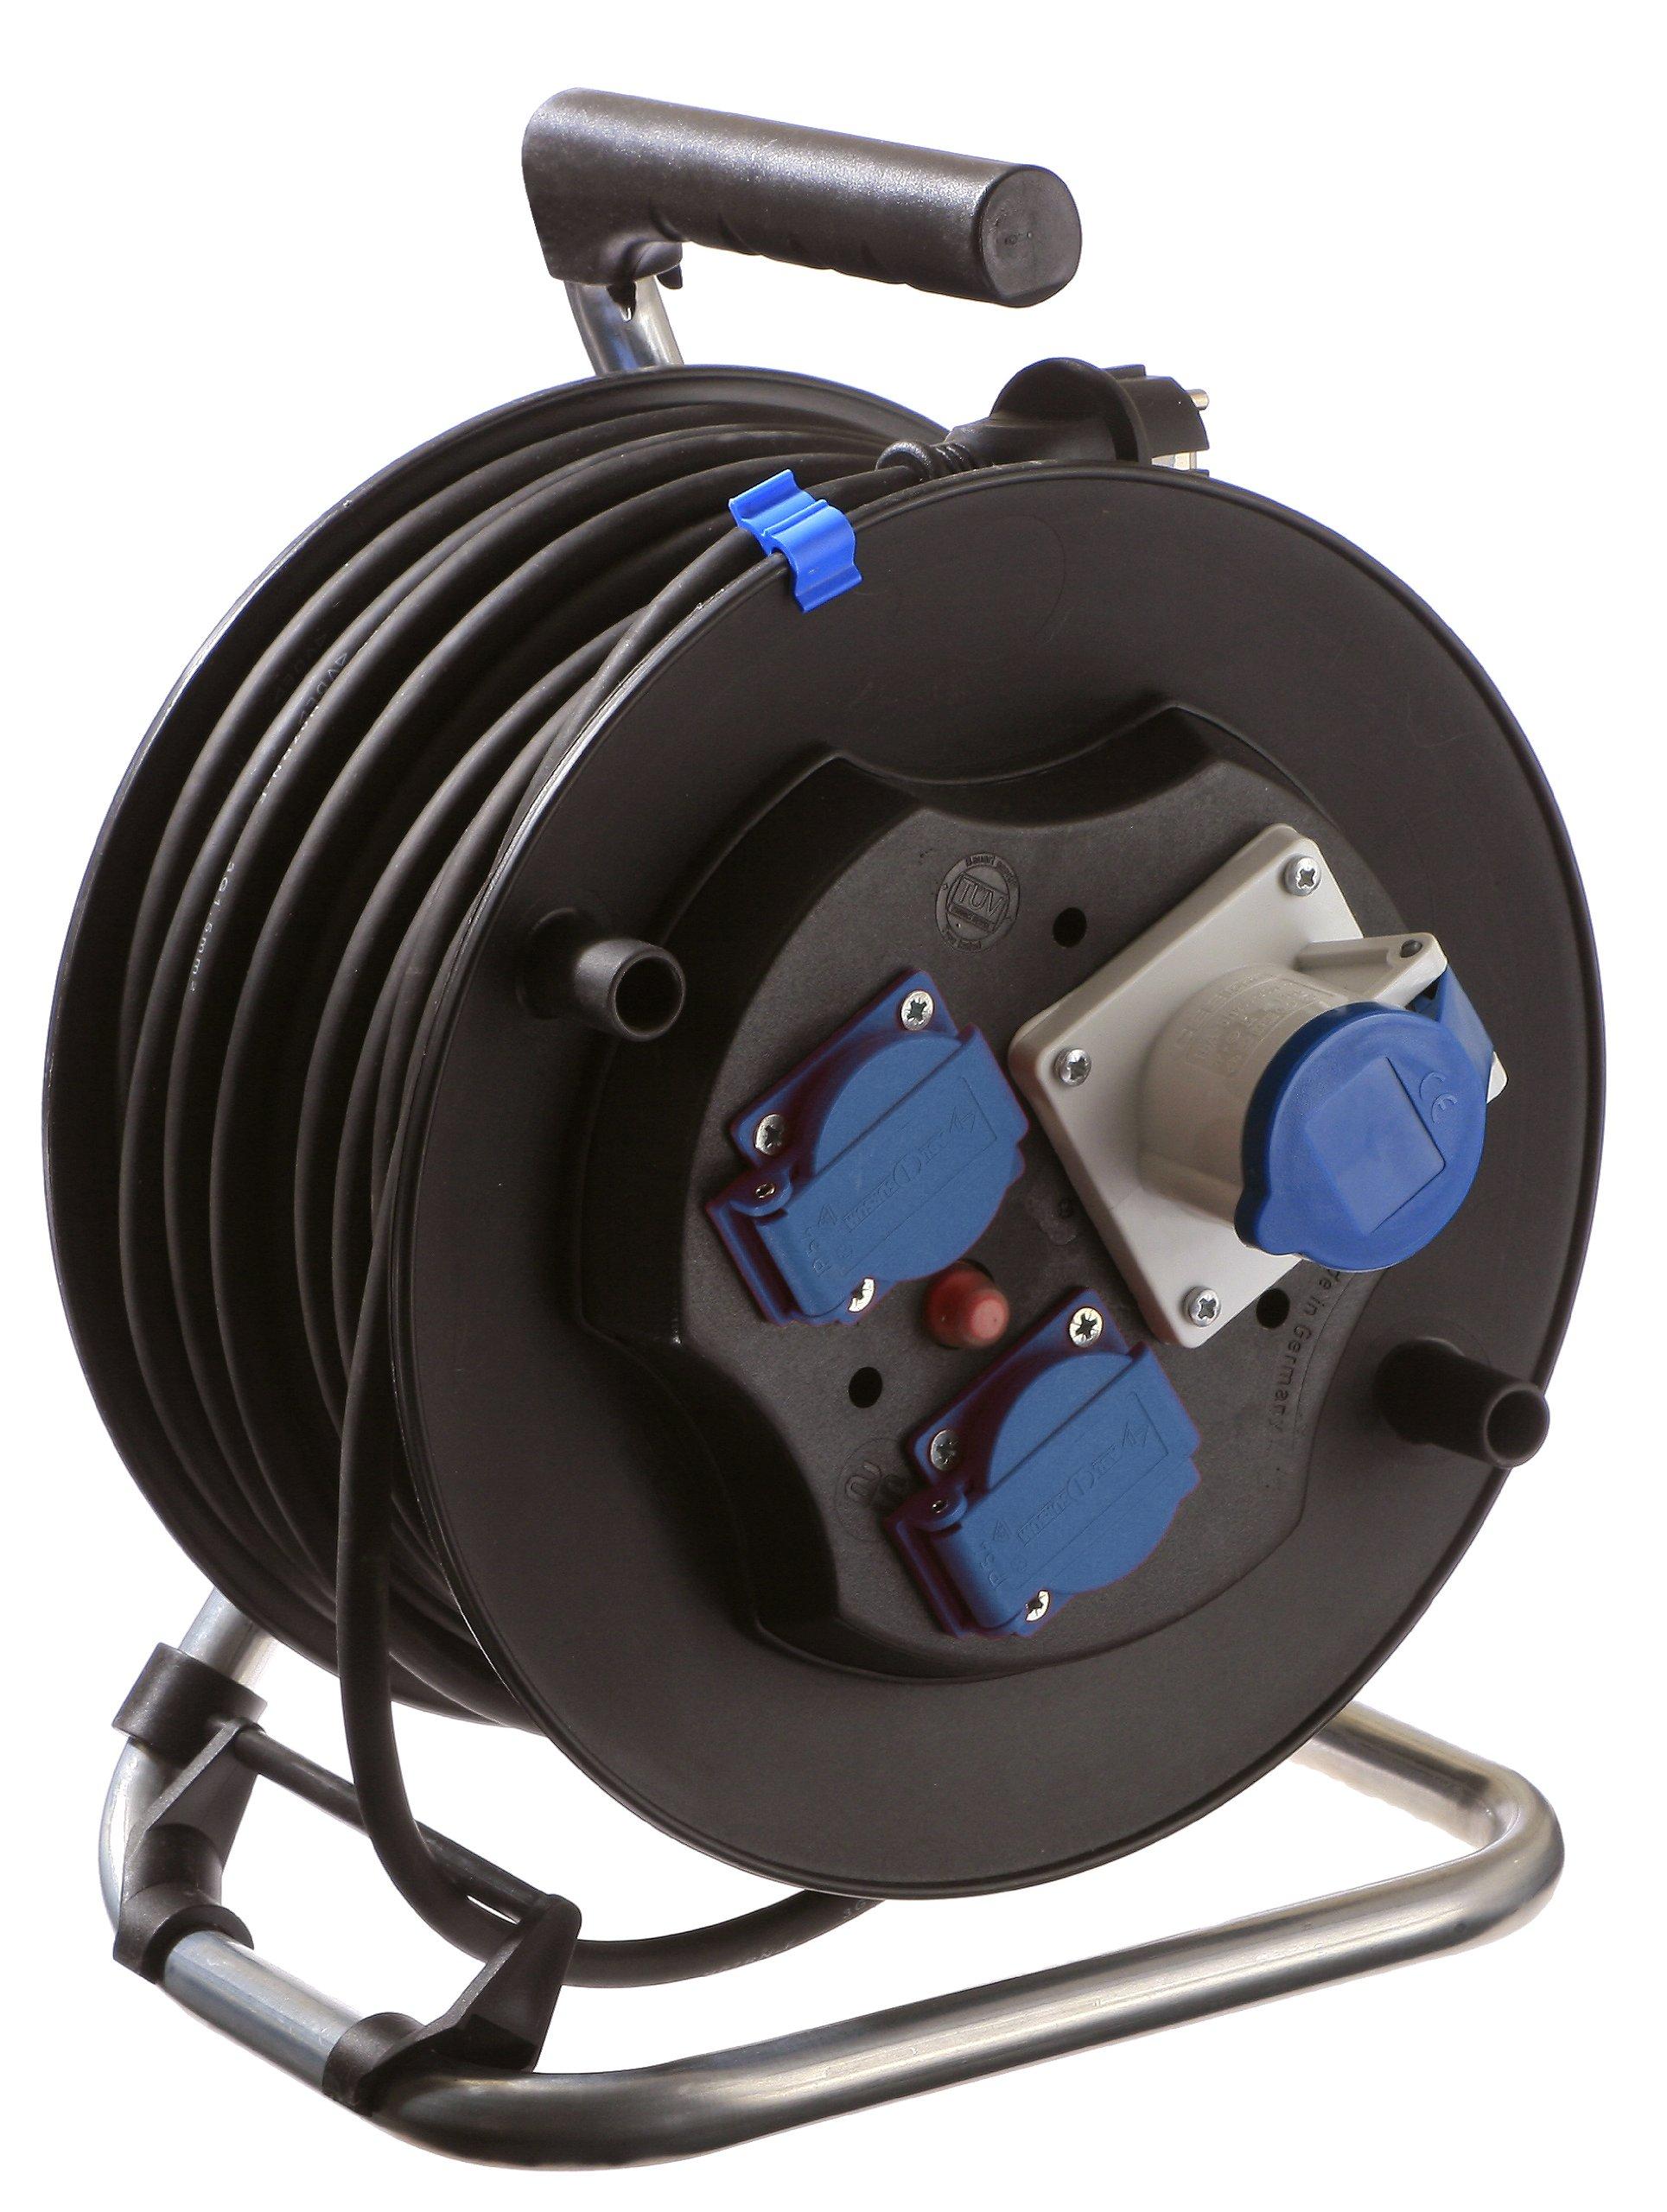 as - Schwabe, 880082, As-Schwabe 880 082 NF / IEC avvolgicavo 285 mm, 230 V / 16 A, 40 yarde, IP 44